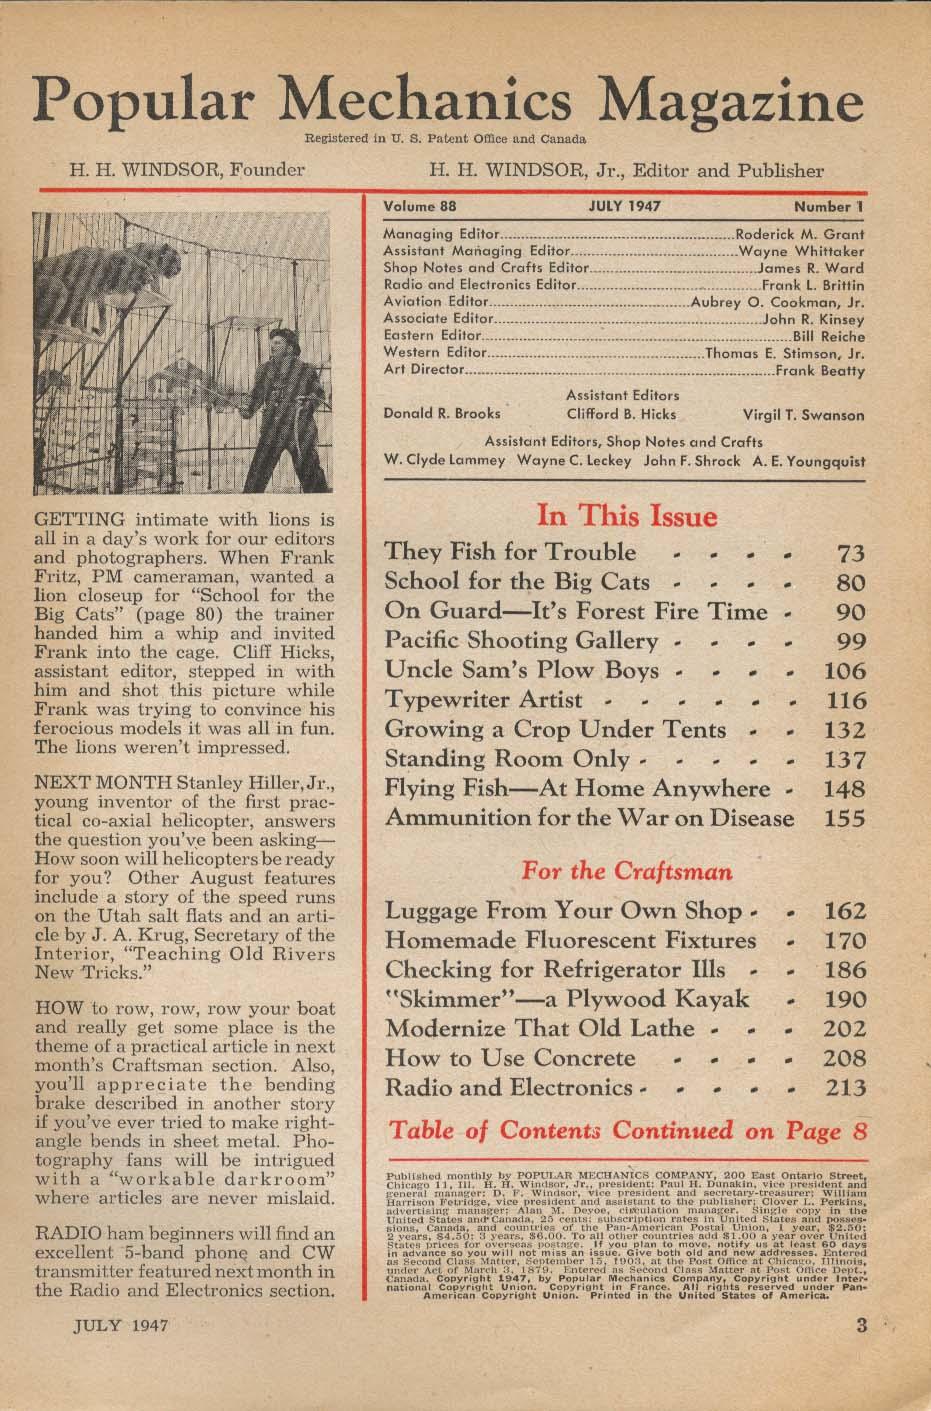 Image for POPULAR MECHANICS Streptomycin Forest Fires New Farm Equipment 7 1947